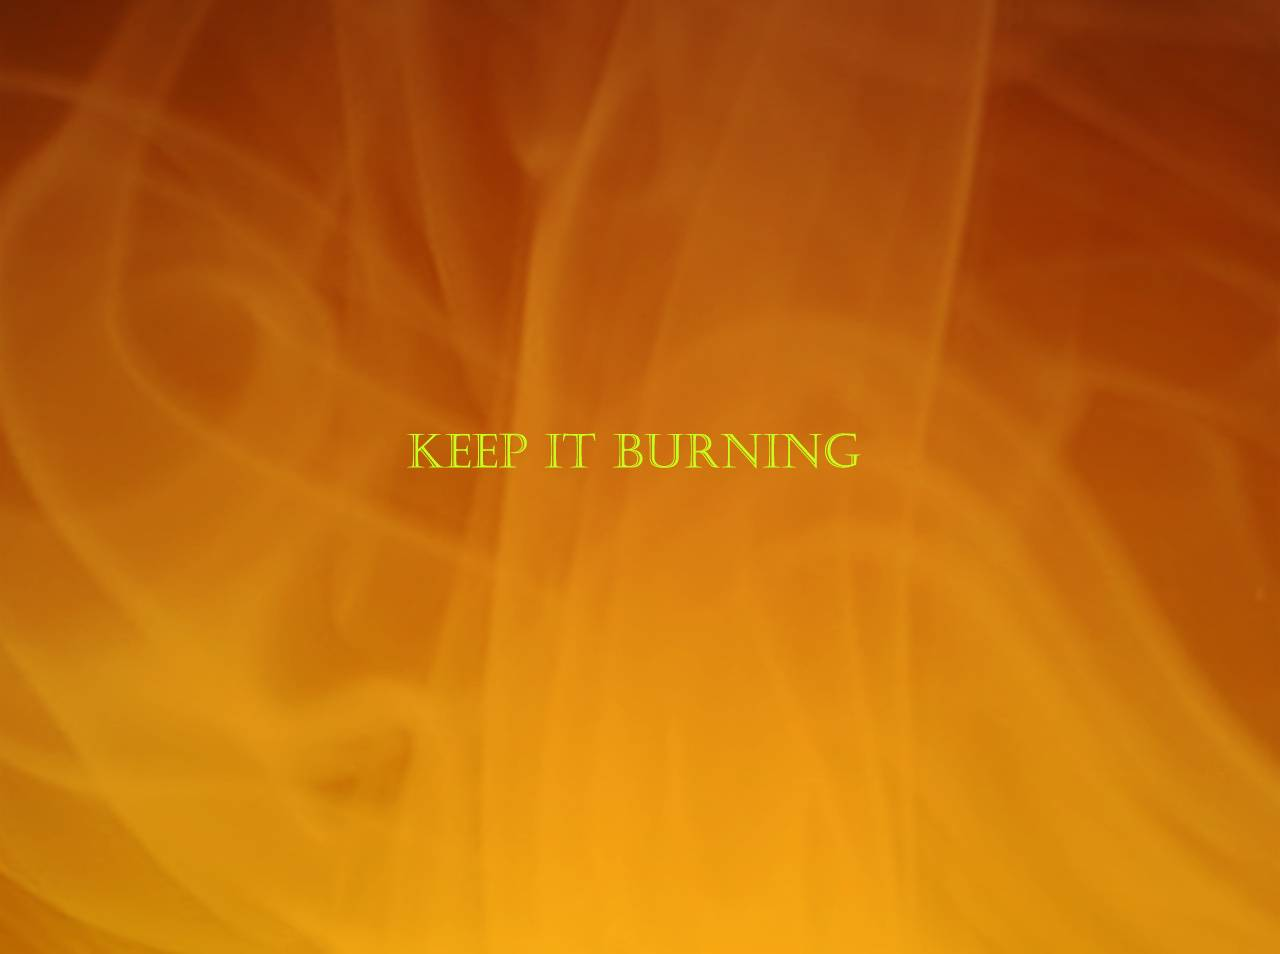 Keep It Burning